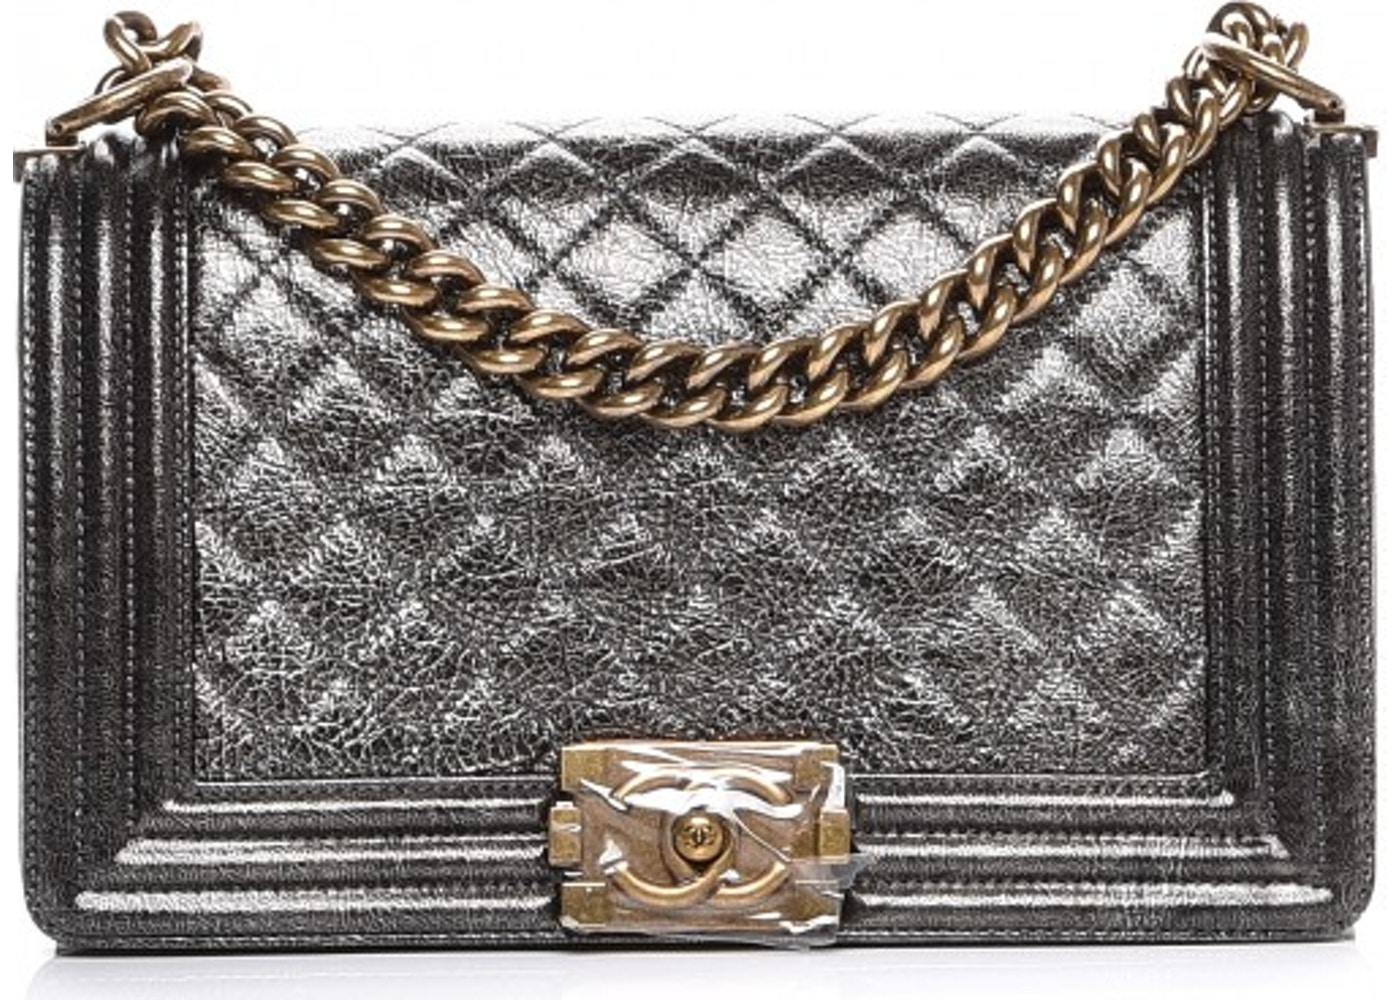 d2ef2ad7b1fb Chanel Boy Flap Quilted Diamond Metallic Medium Dark Silver. Quilted  Diamond Metallic Medium Dark Silver